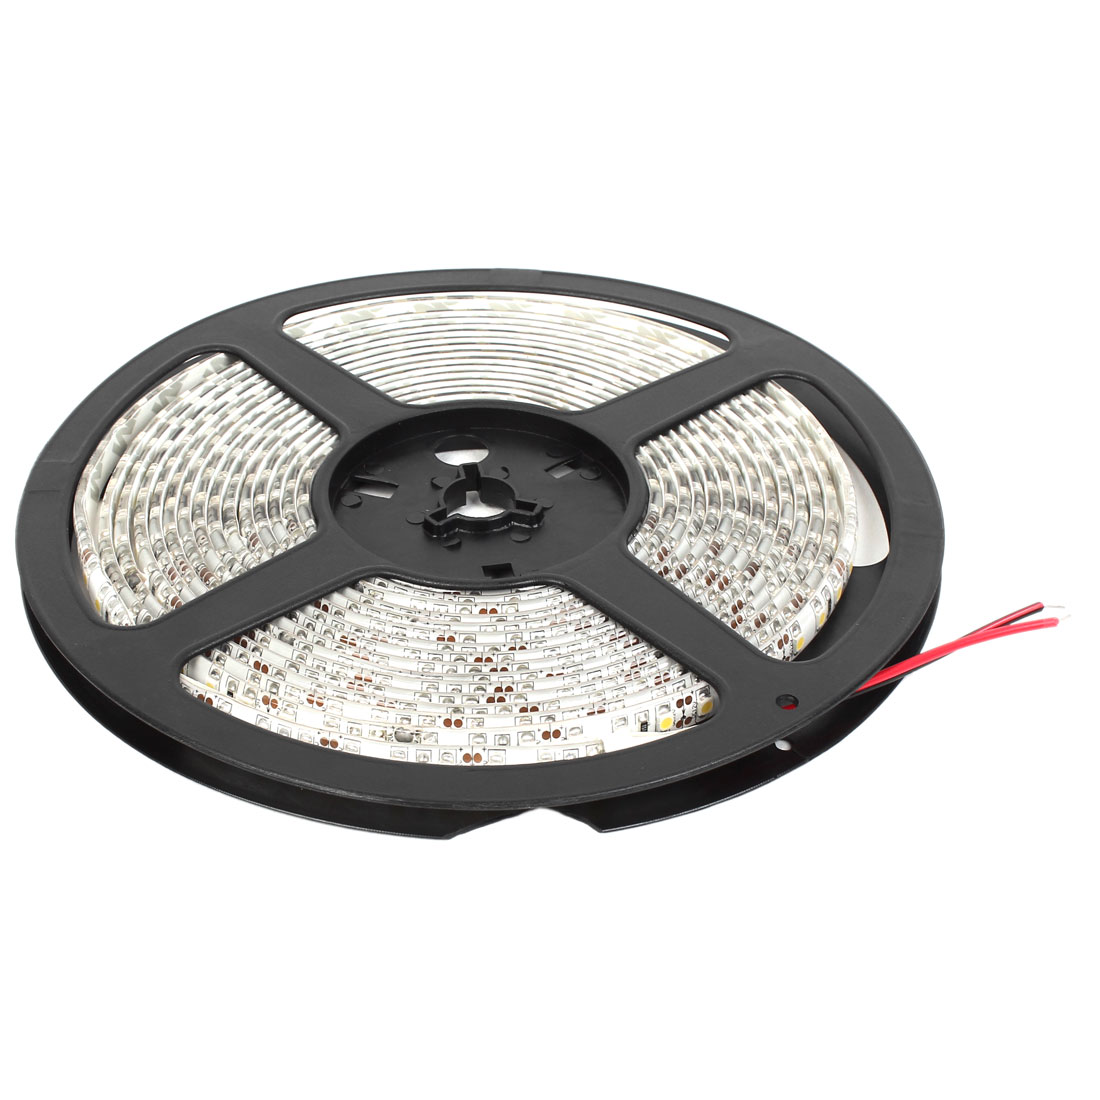 Indoor DC 12V Warm White 3528 SMD 600 LEDs Flexible LED Strip Light 5M